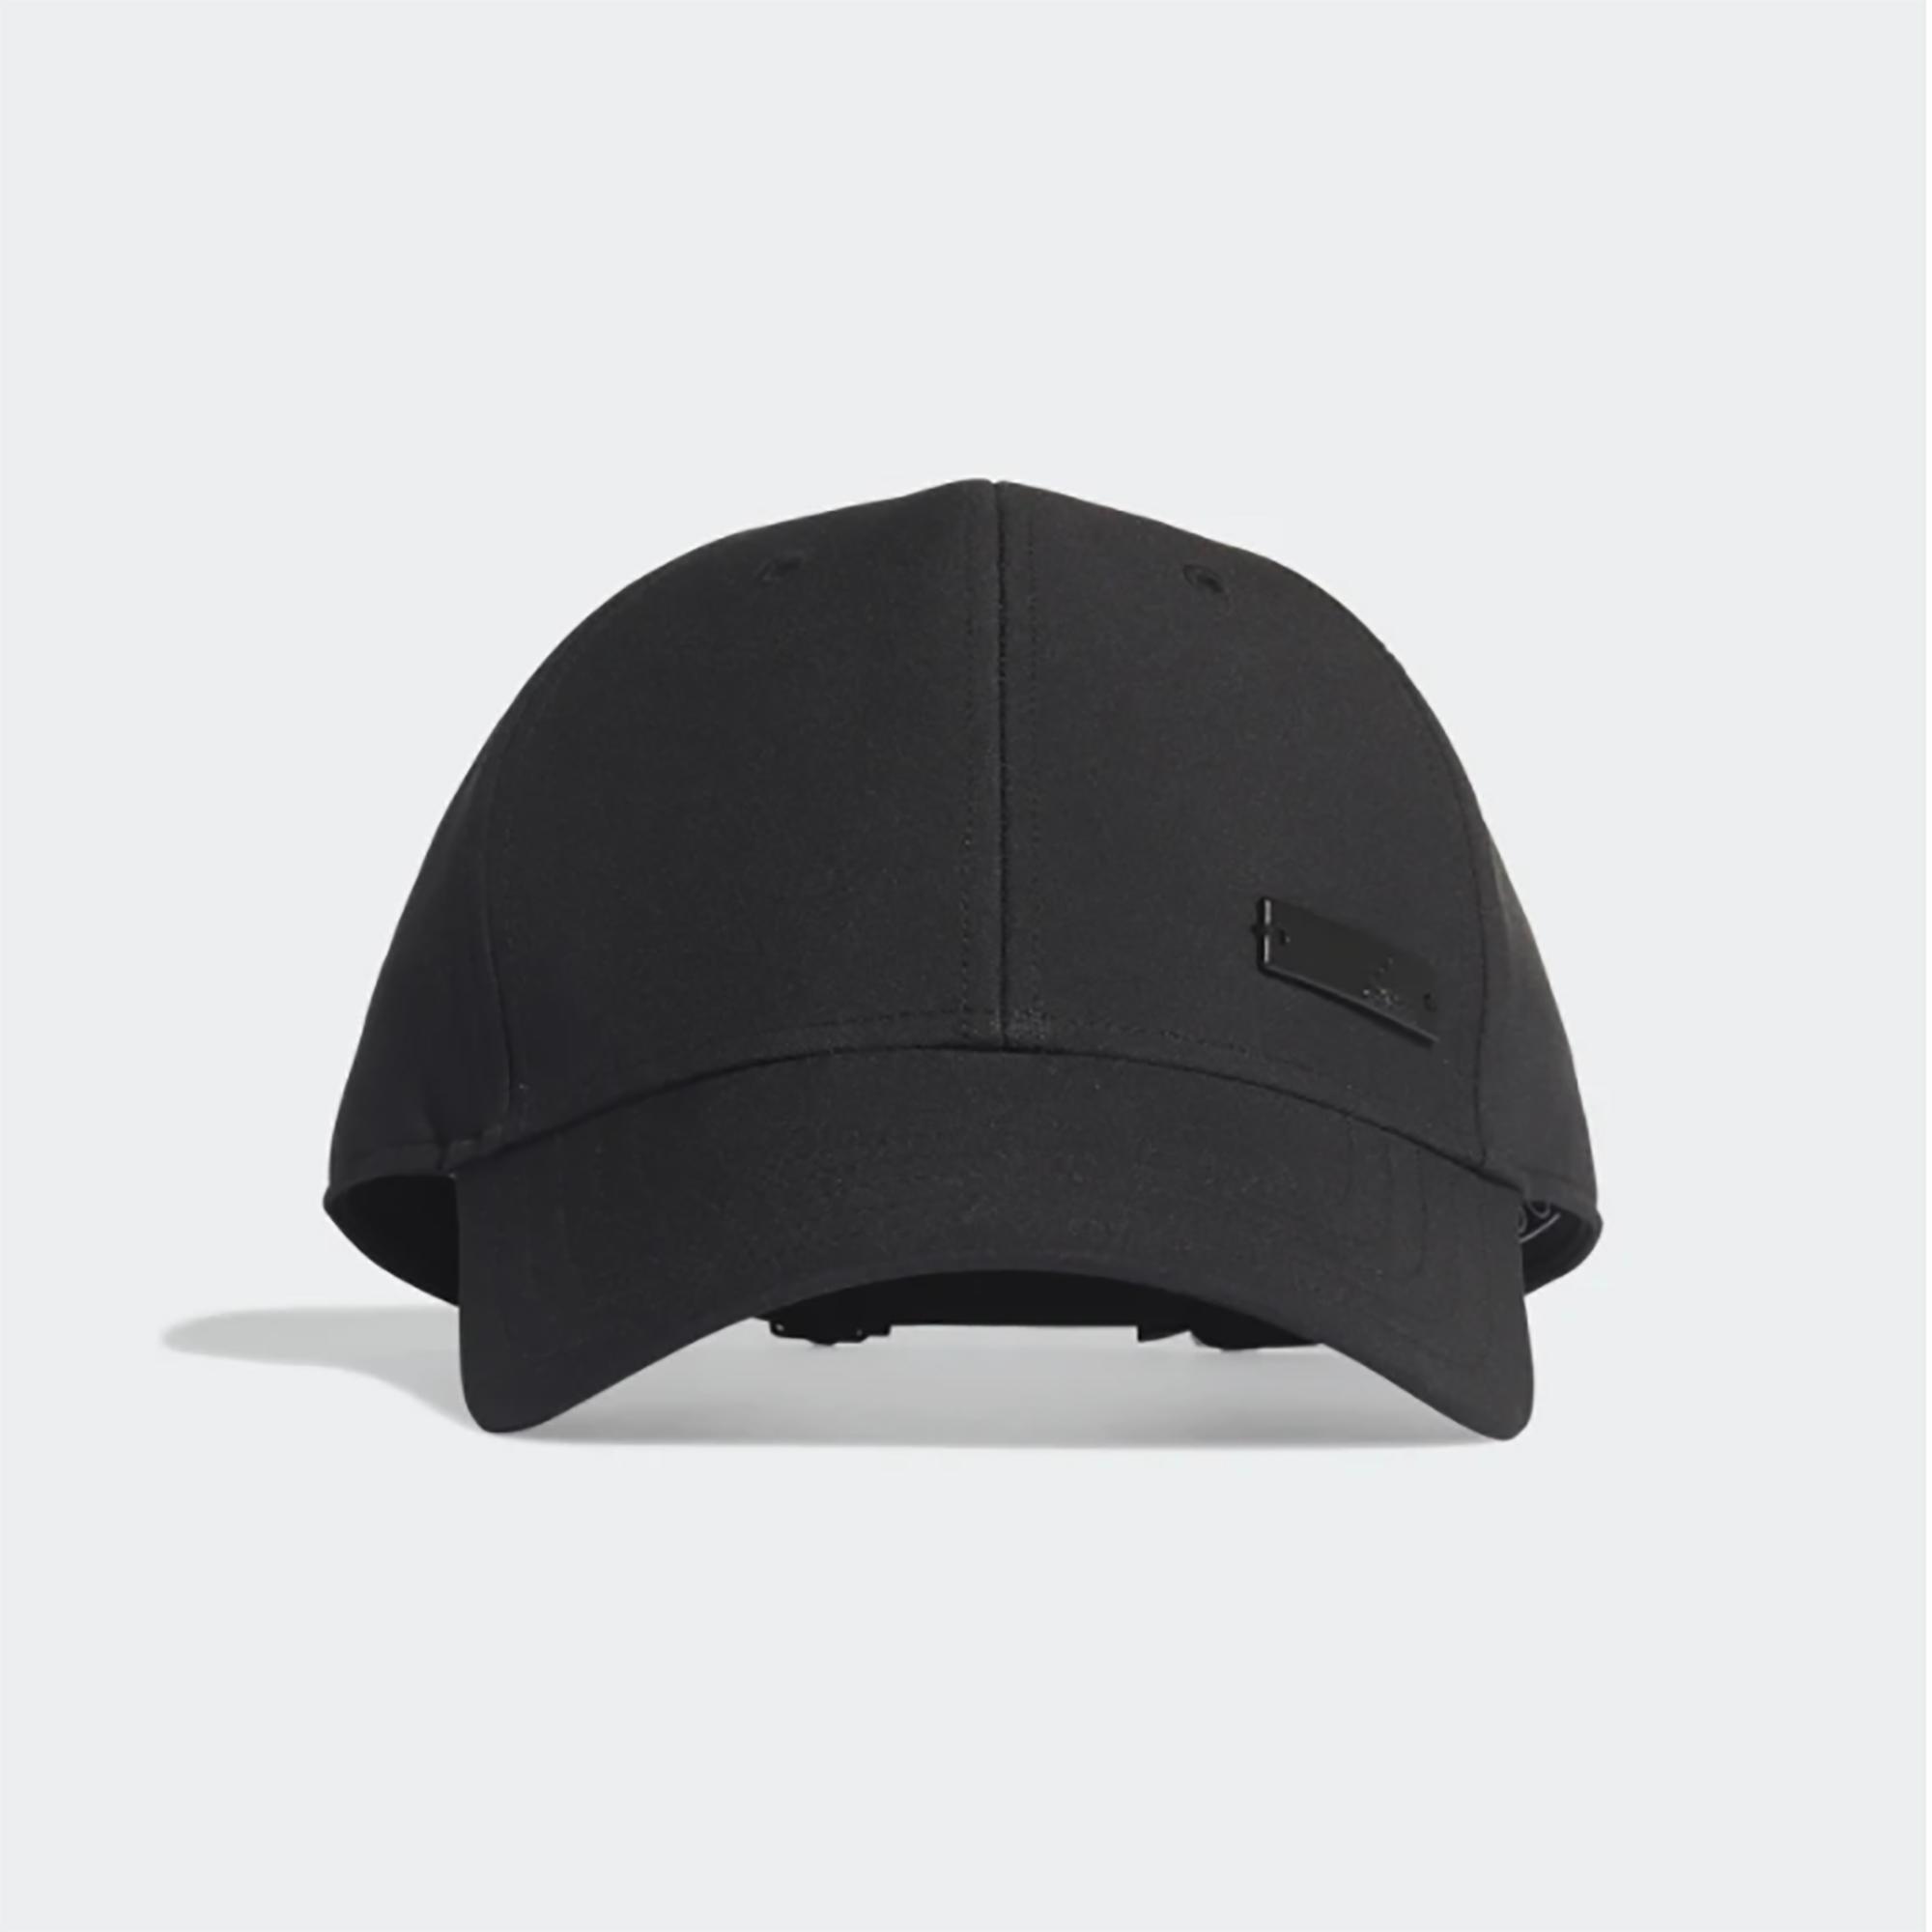 Şapcă Adidas fitness Negru imagine